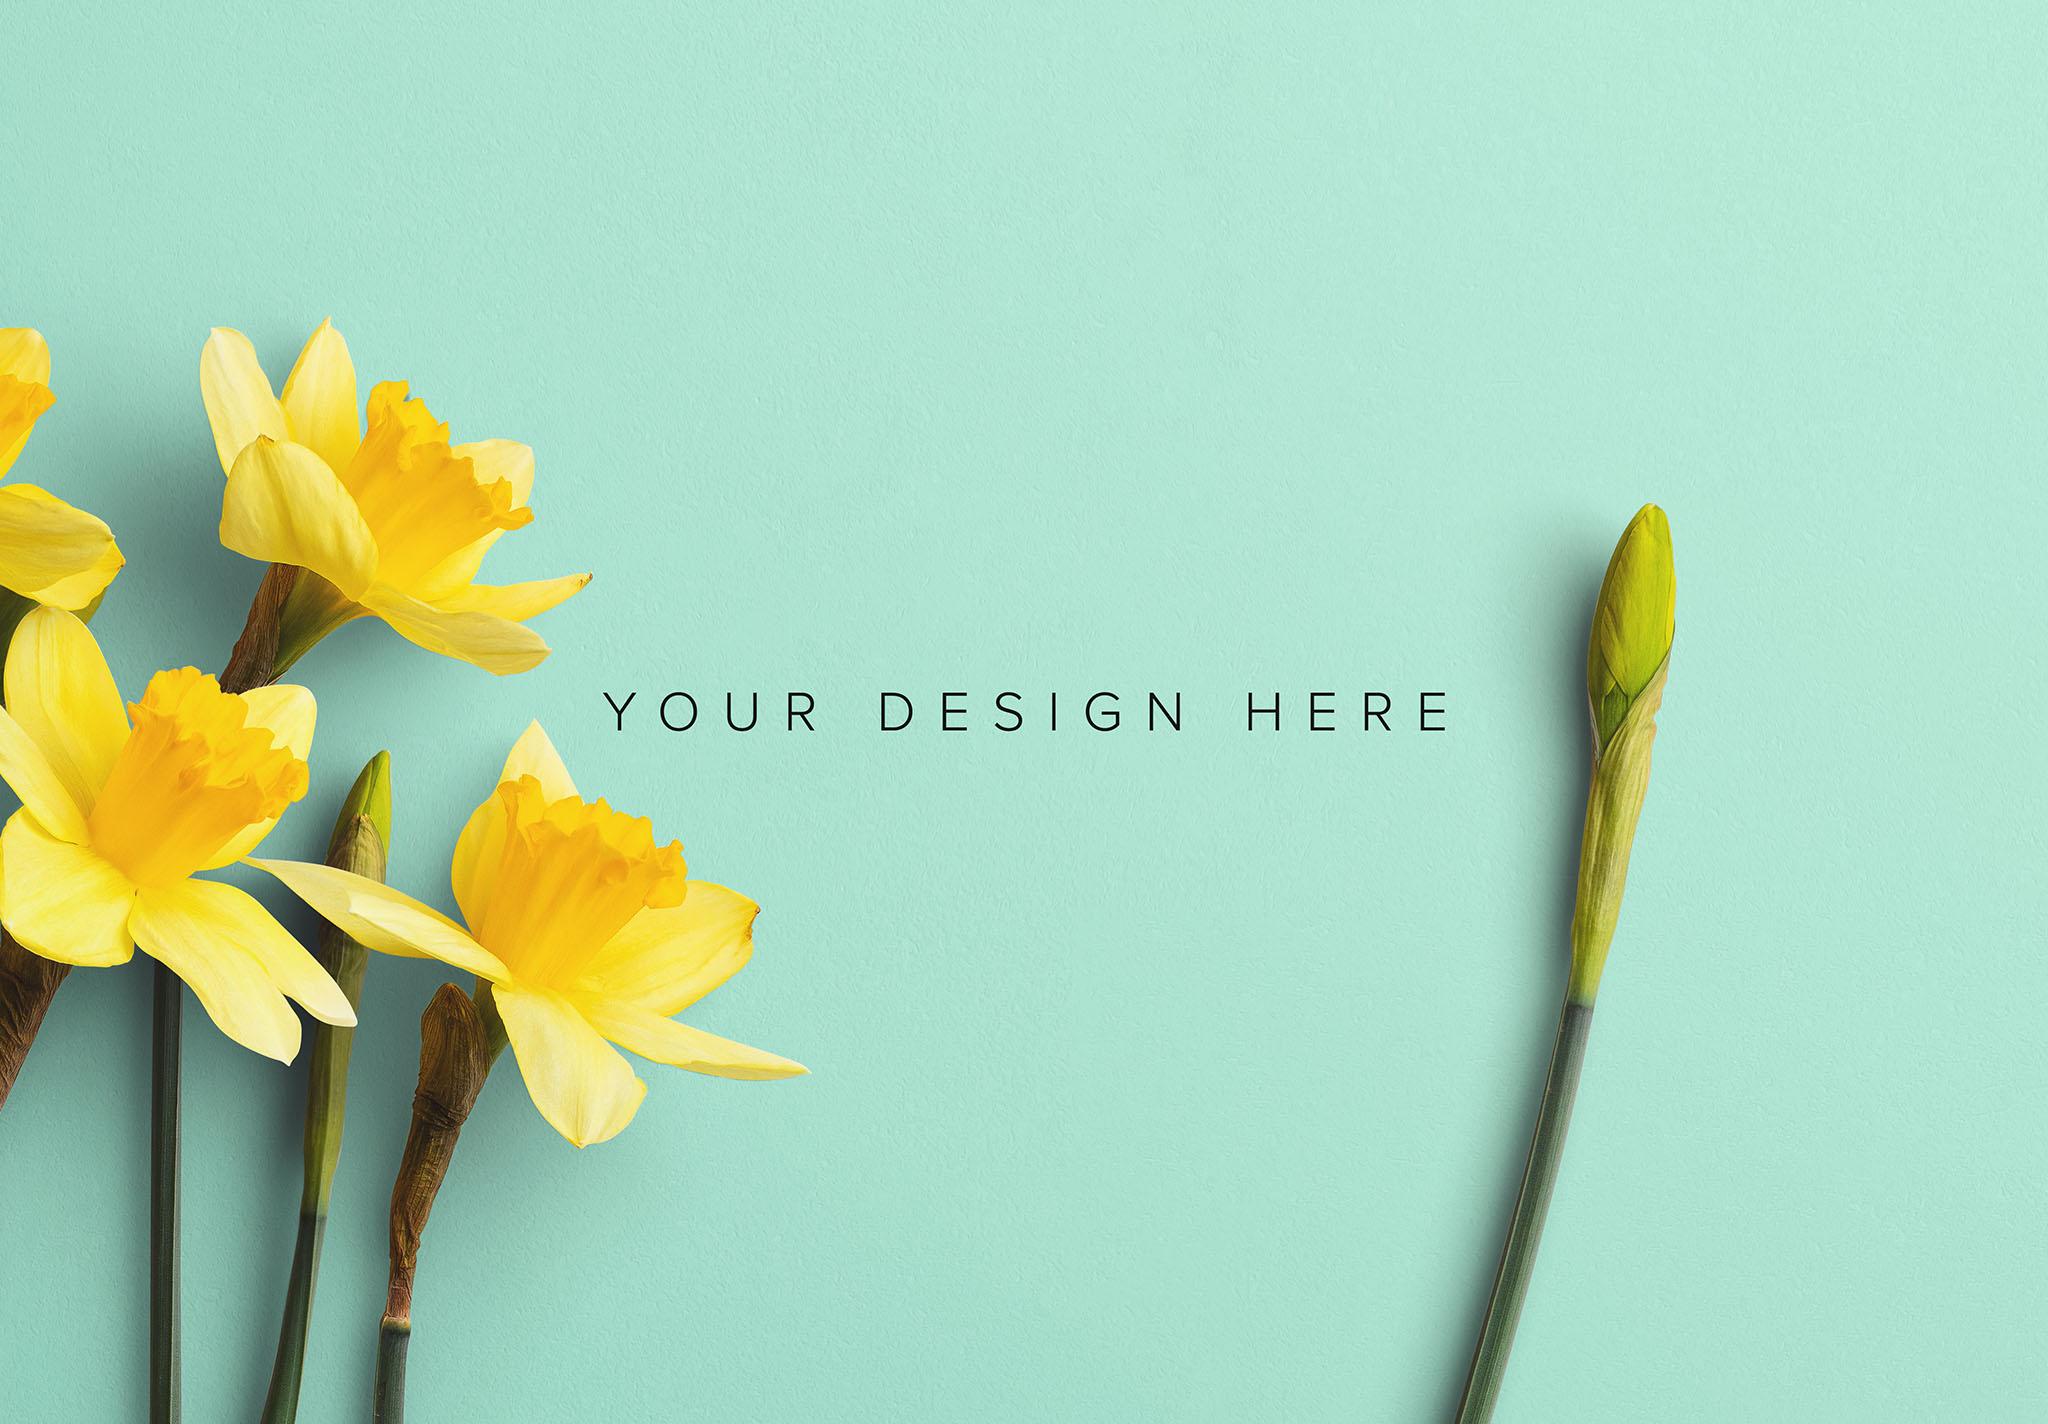 Daffodils Custom Scene Creator Template 9 Image03